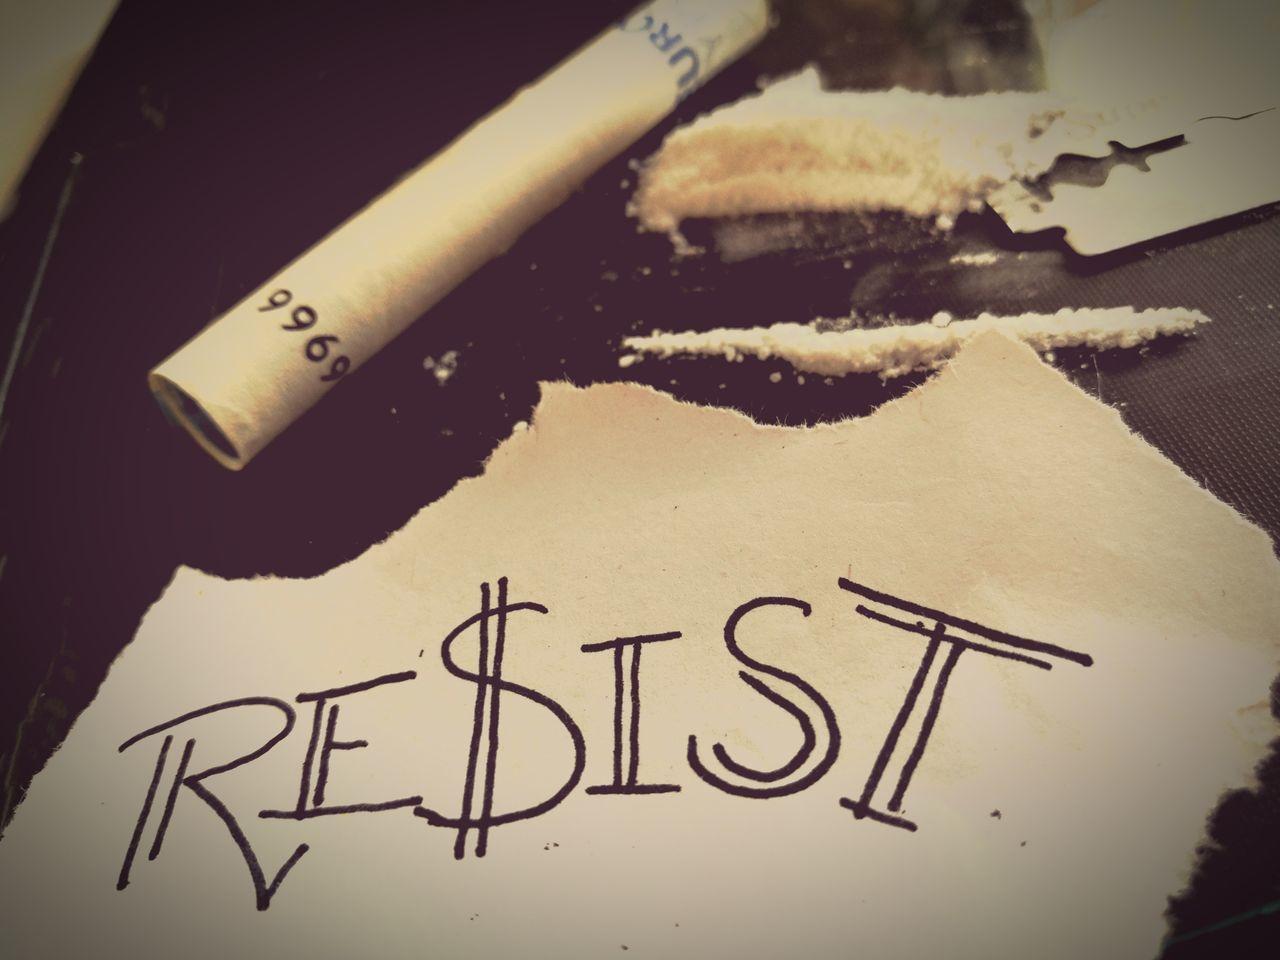 Resist EyeEmNewHere DrugFree Drug Addiction